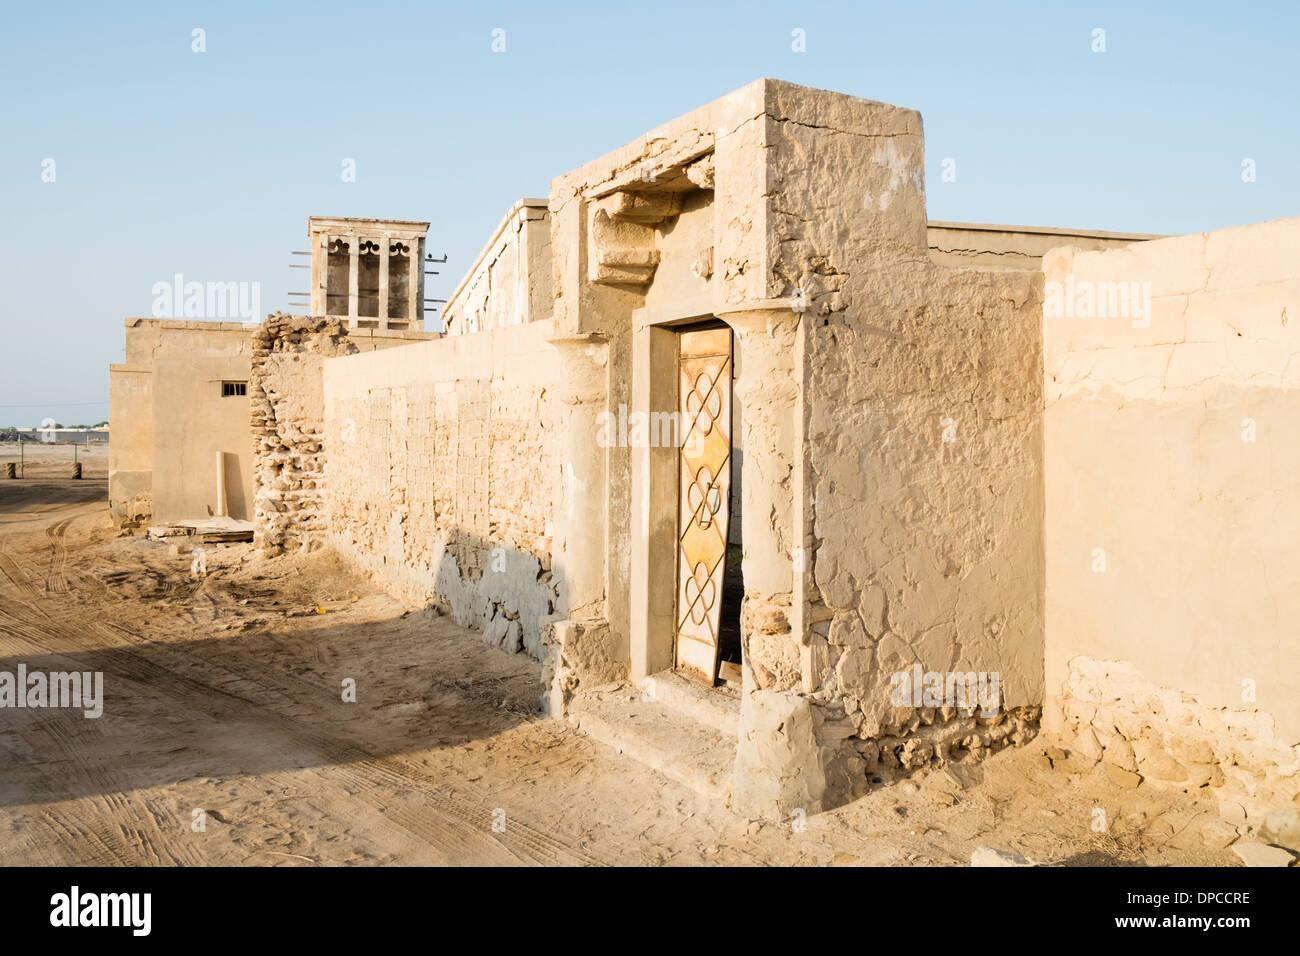 Deserted former fishing village at jazirat al hamra in ras for Home of architecture ras al khaimah